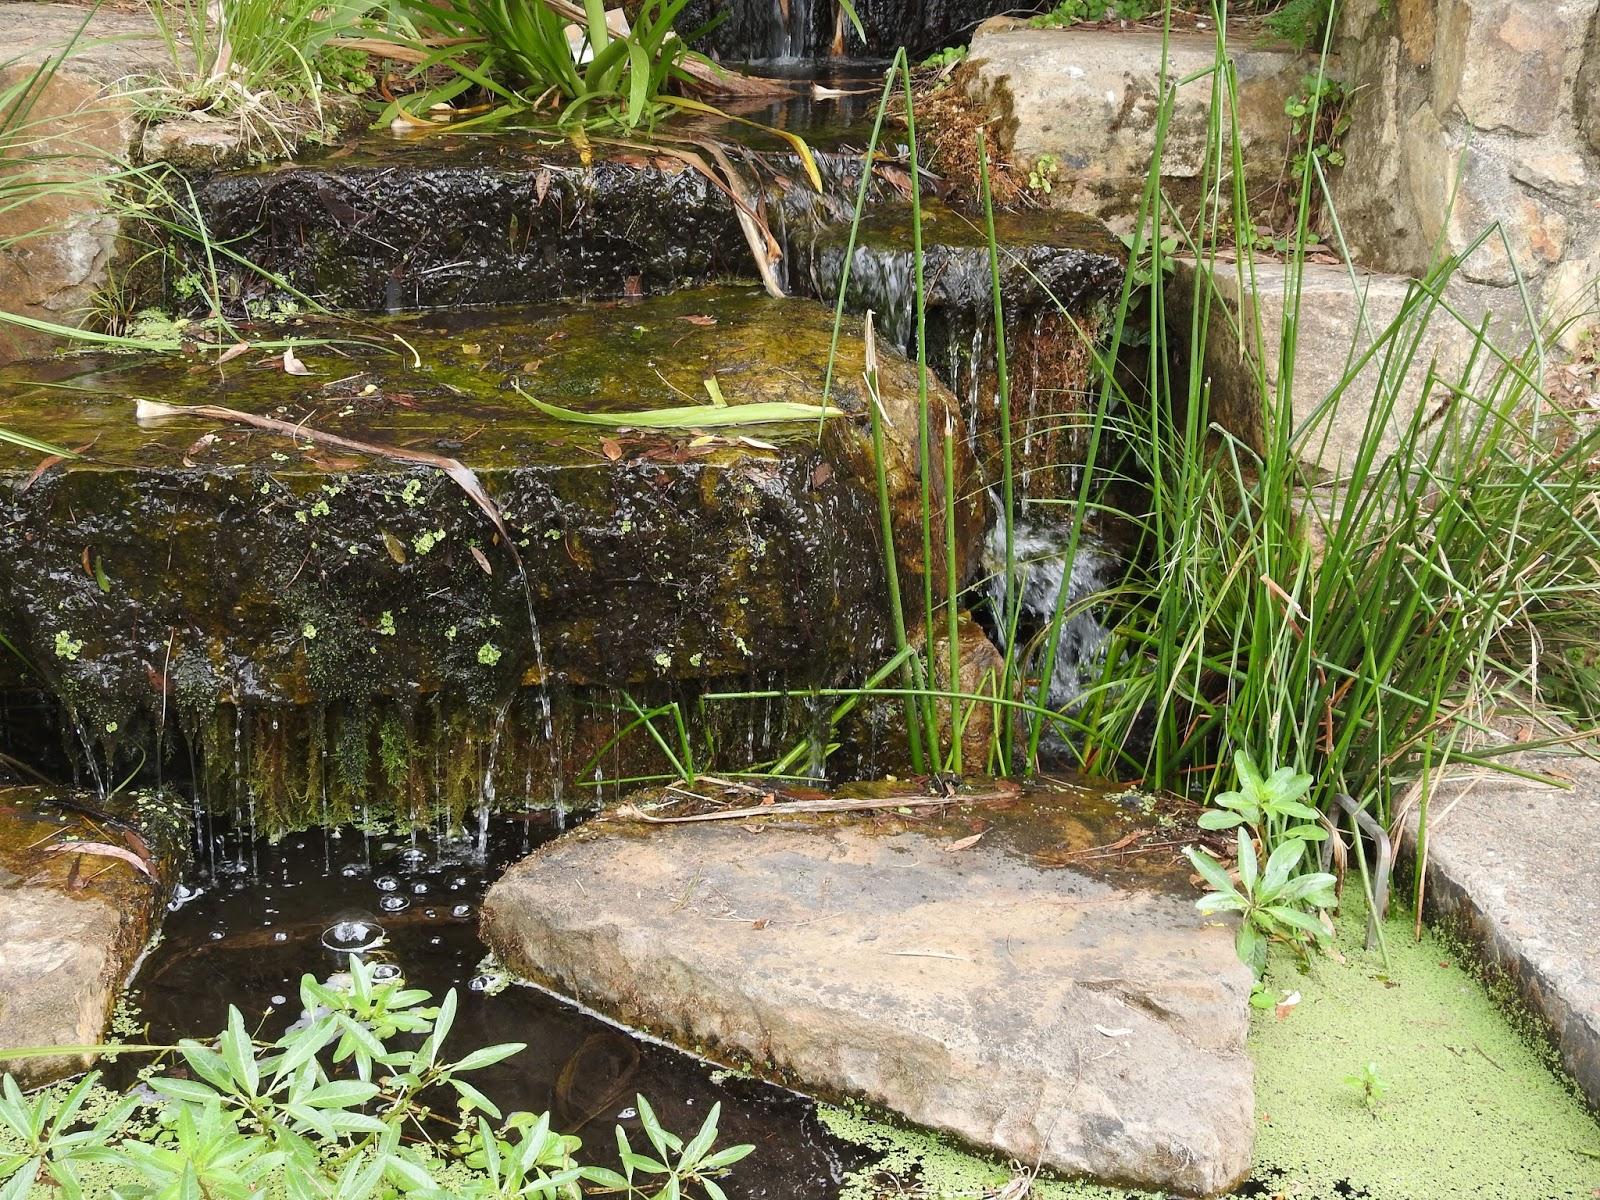 Australian National Botanical Gardens, Canberra | FEAST OR FAMINE